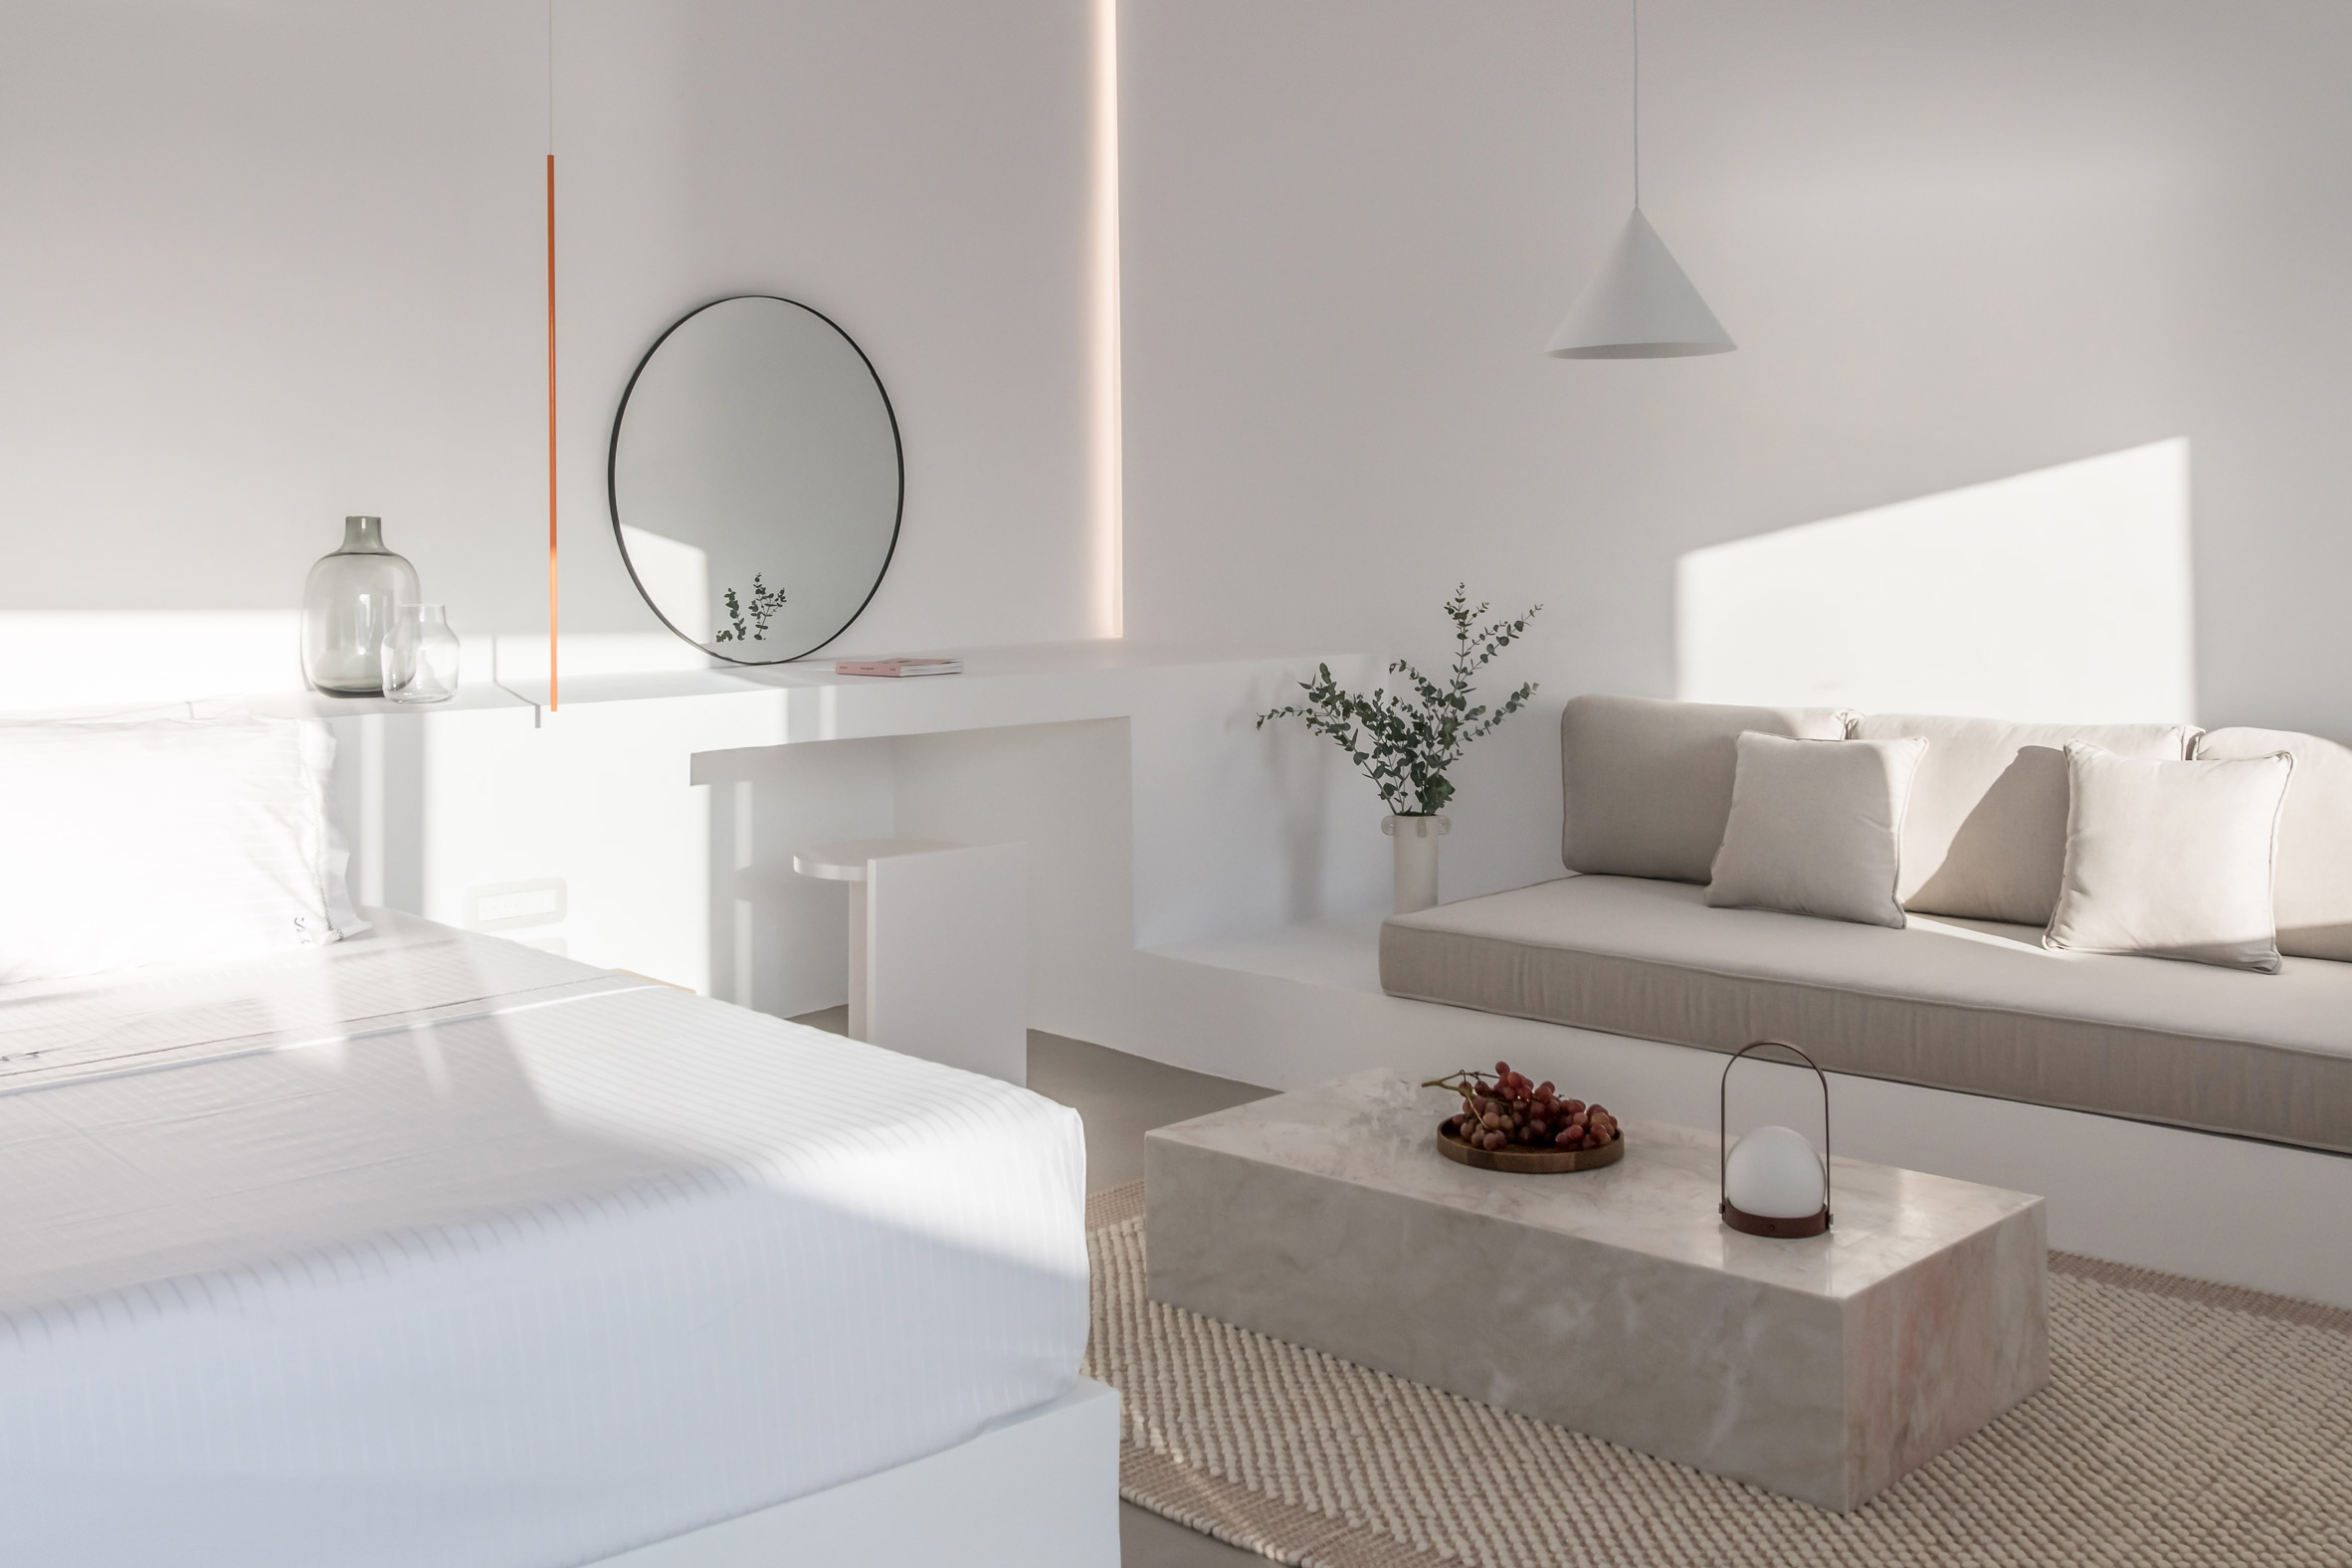 23_Saint Hotel_Kapsimalis Architects_Inspirationist